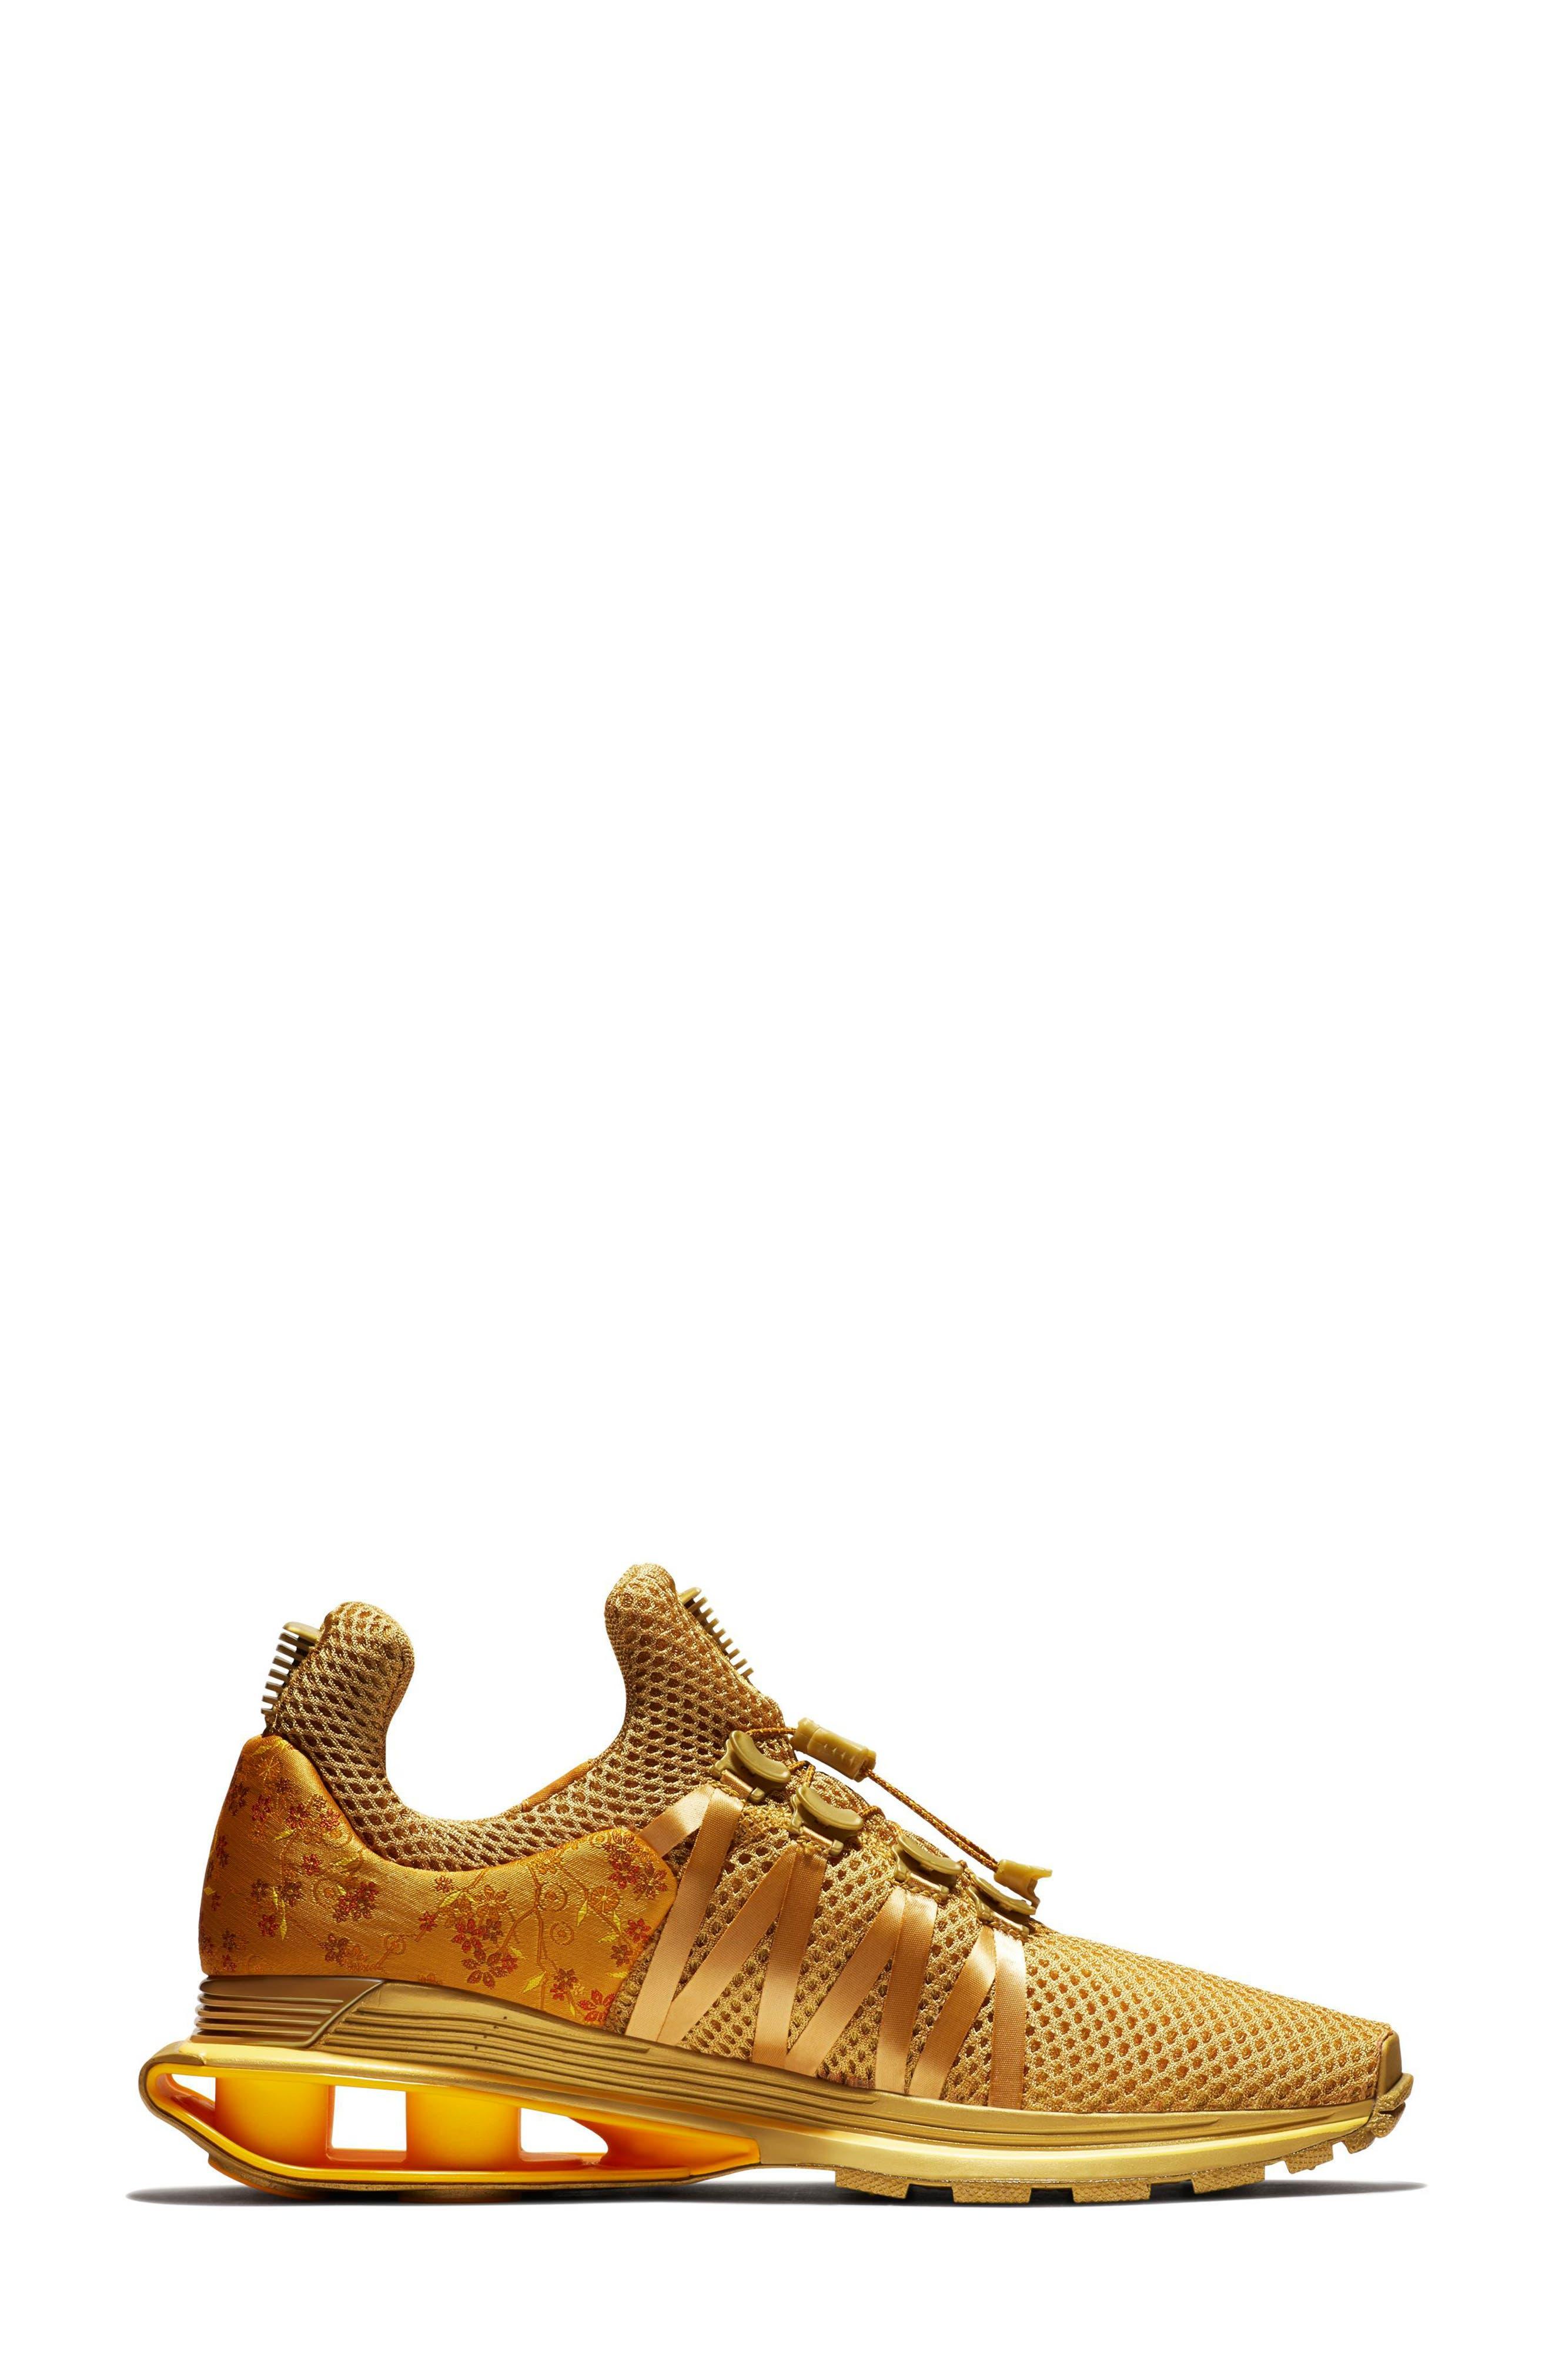 Shox Gravity Sneaker,                             Alternate thumbnail 3, color,                             Metallic Gold/ Metallic Gold